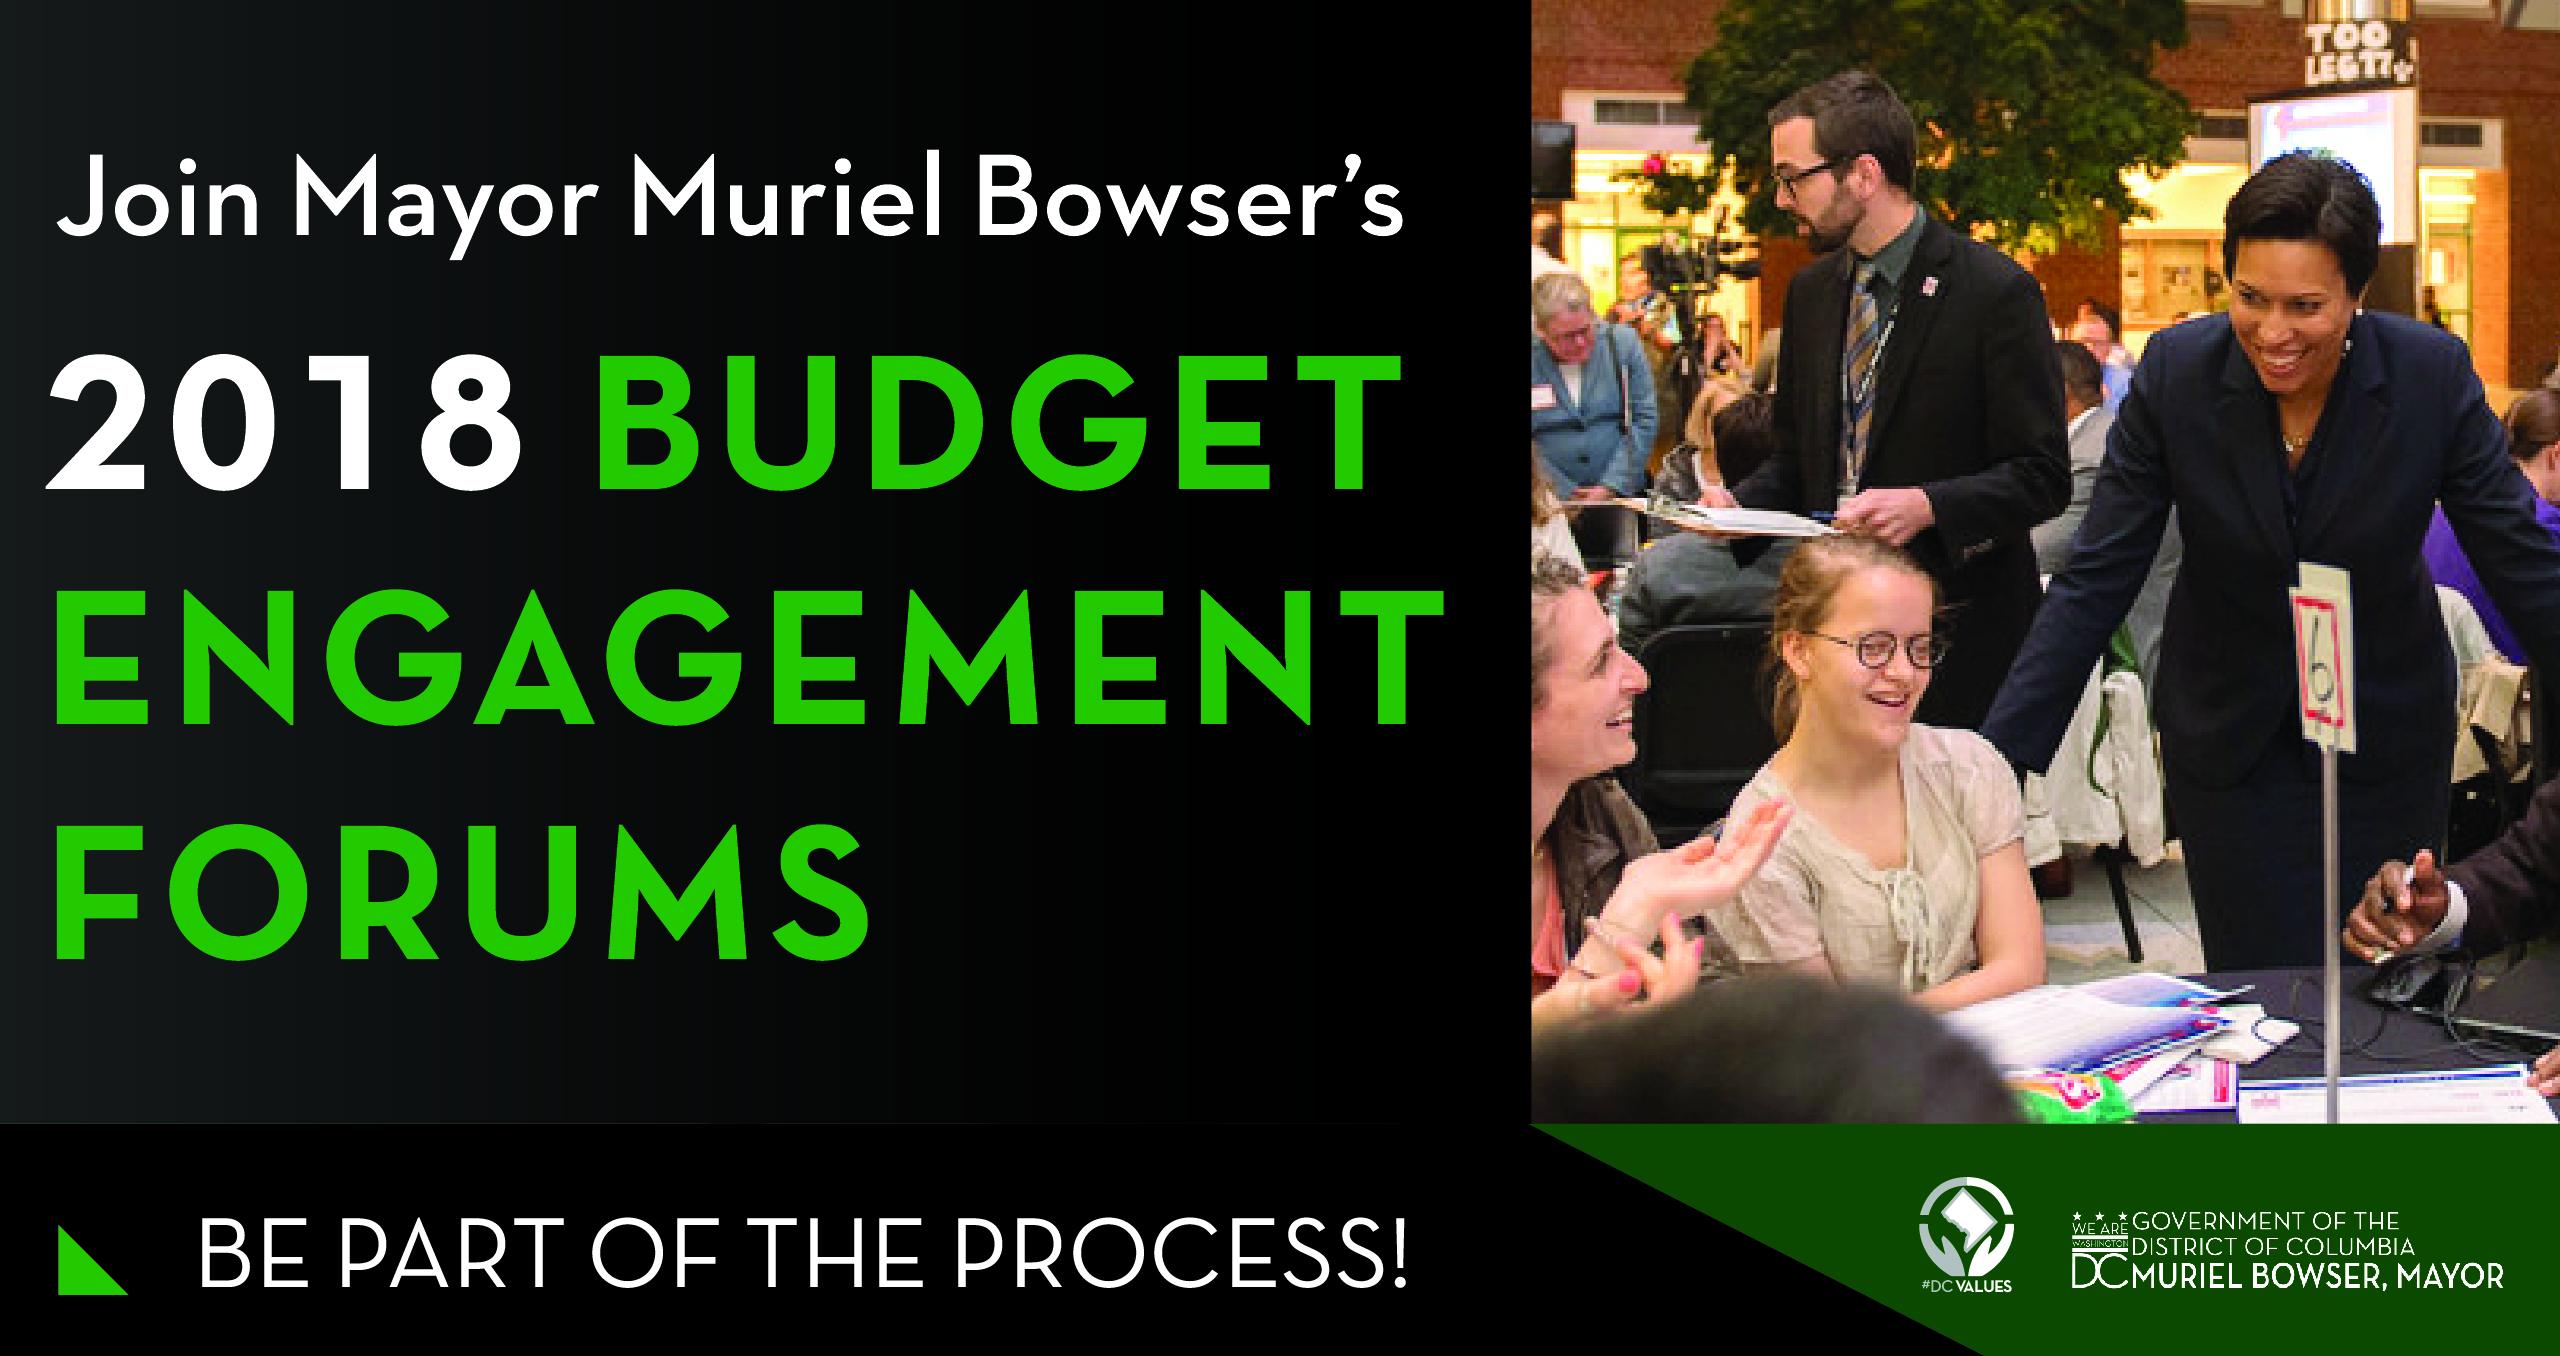 2018 Budget Engagement Forum